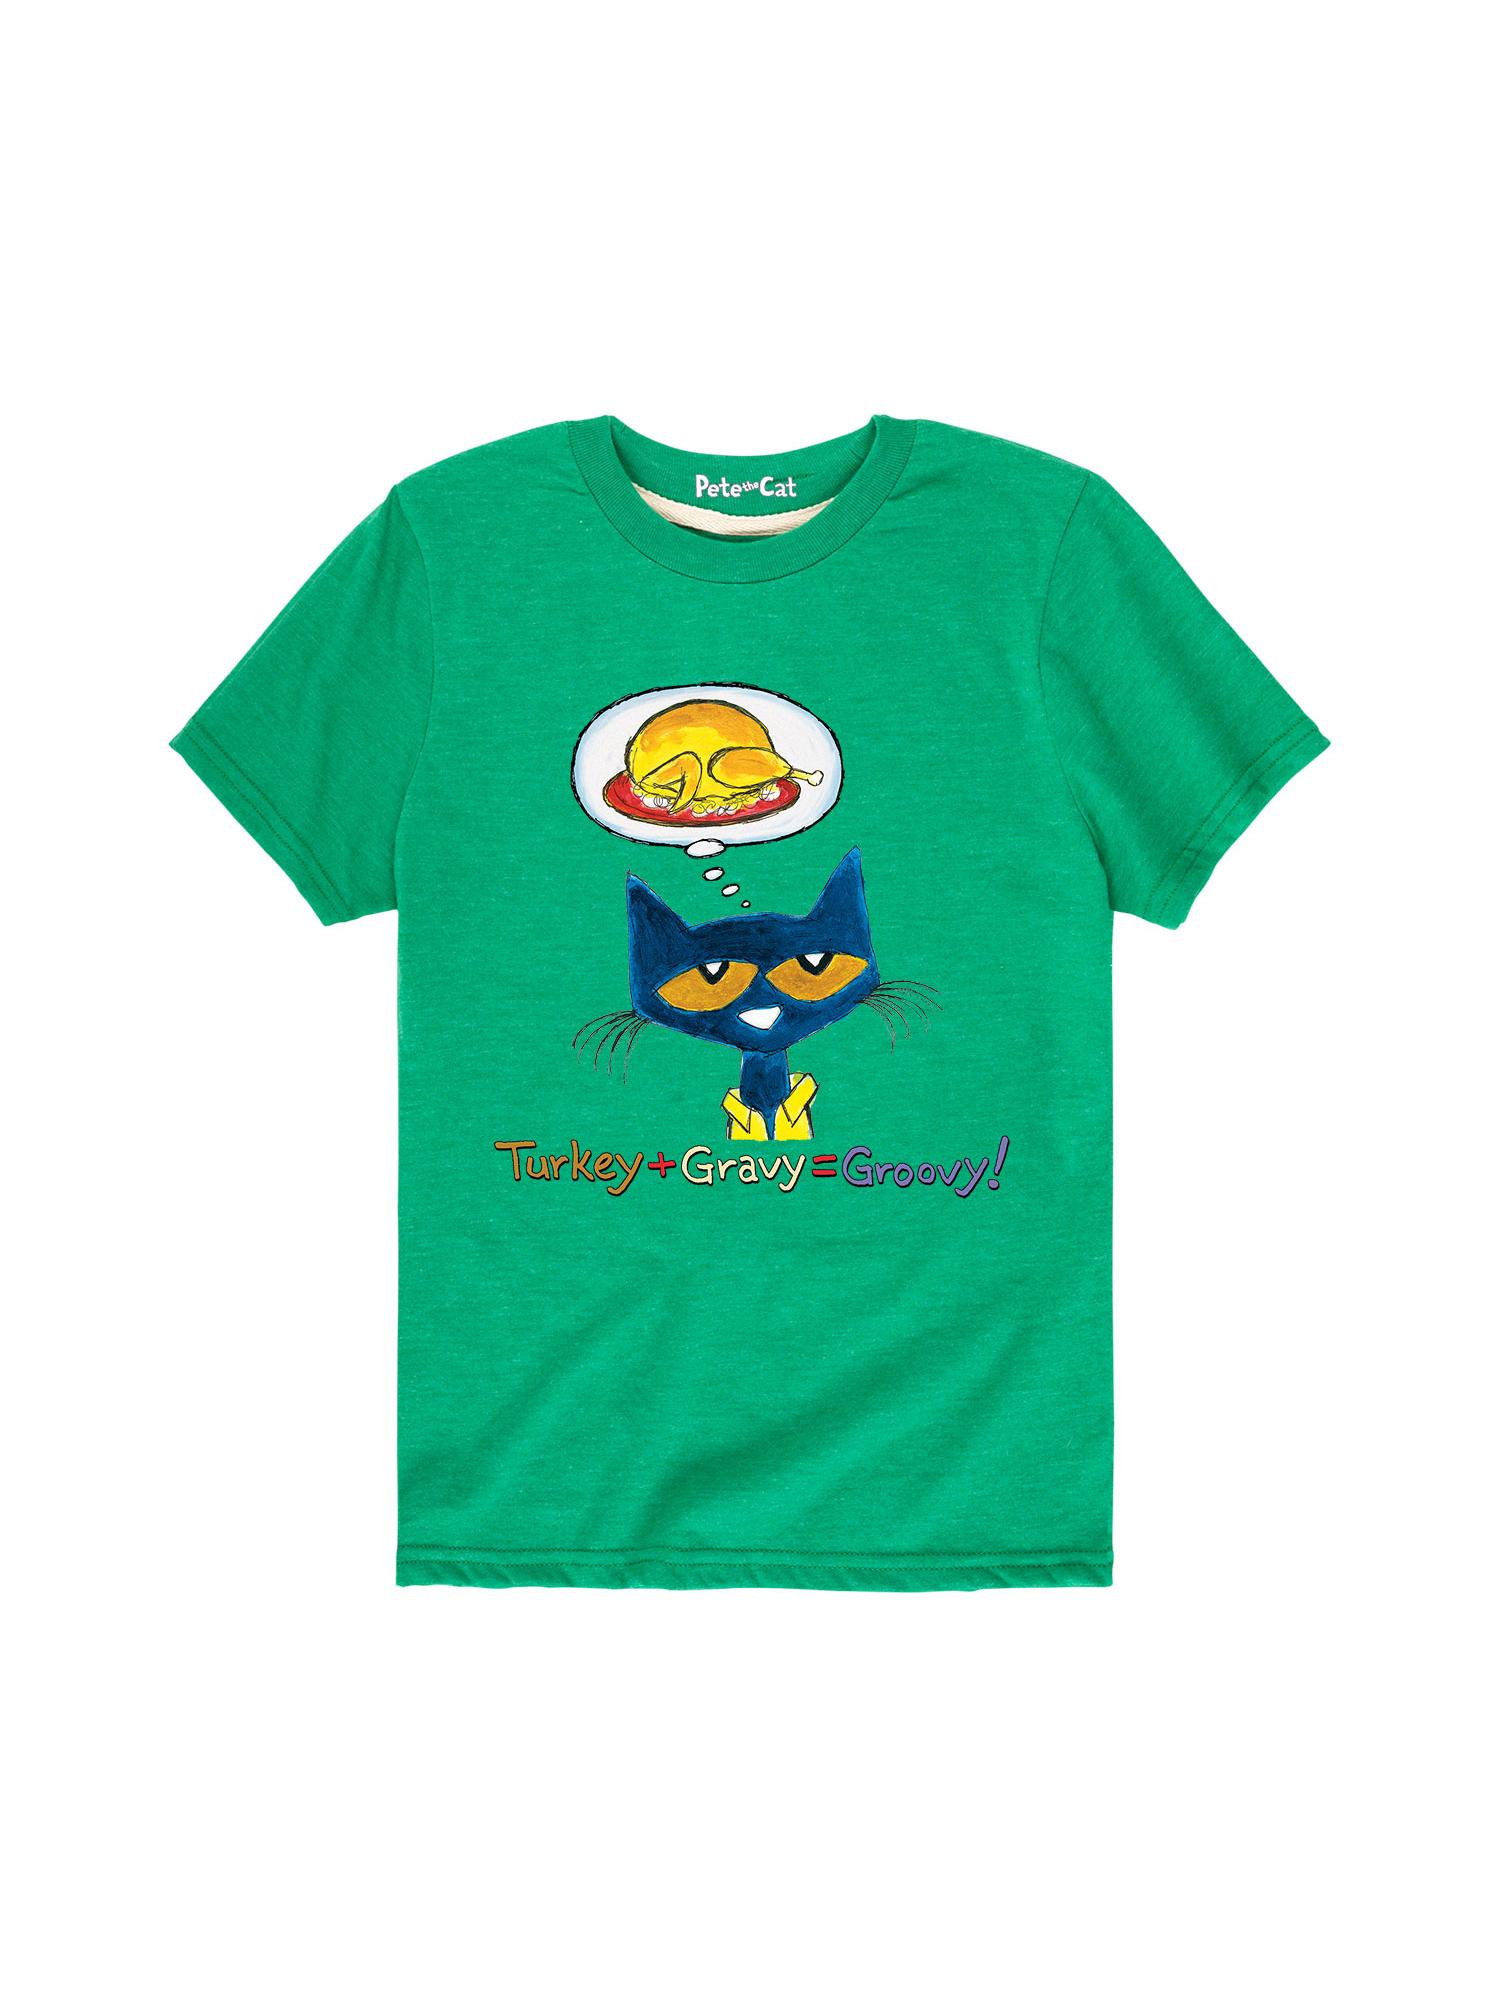 Pete The Cat Turkey + Gravy = Groovy! - Toddler Short Sleeve Tee